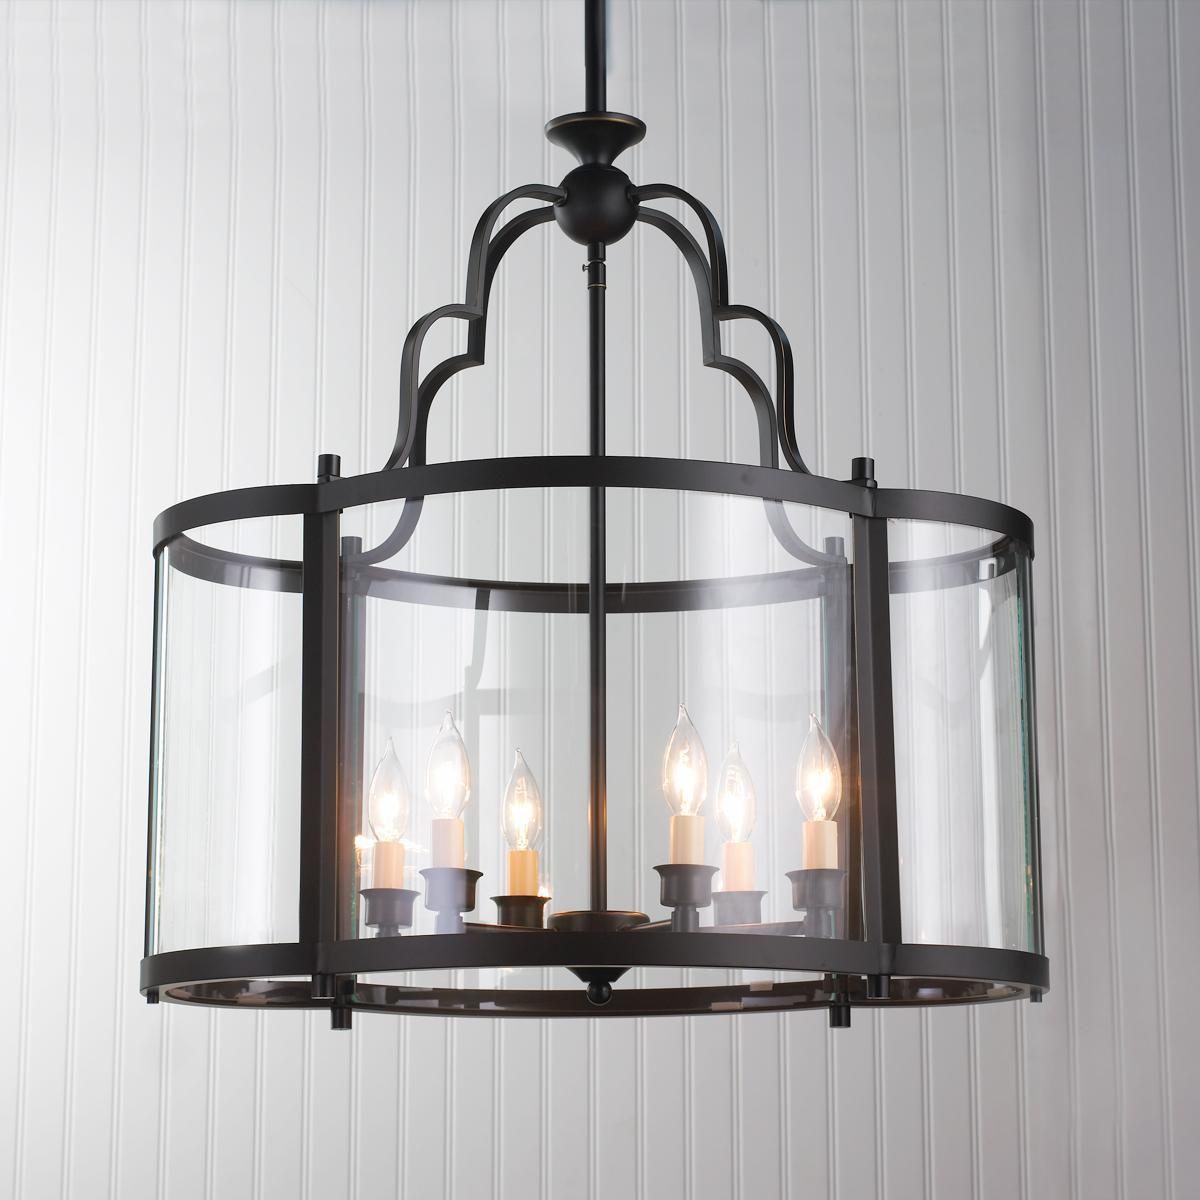 Oval Quatrefoil Lantern Large